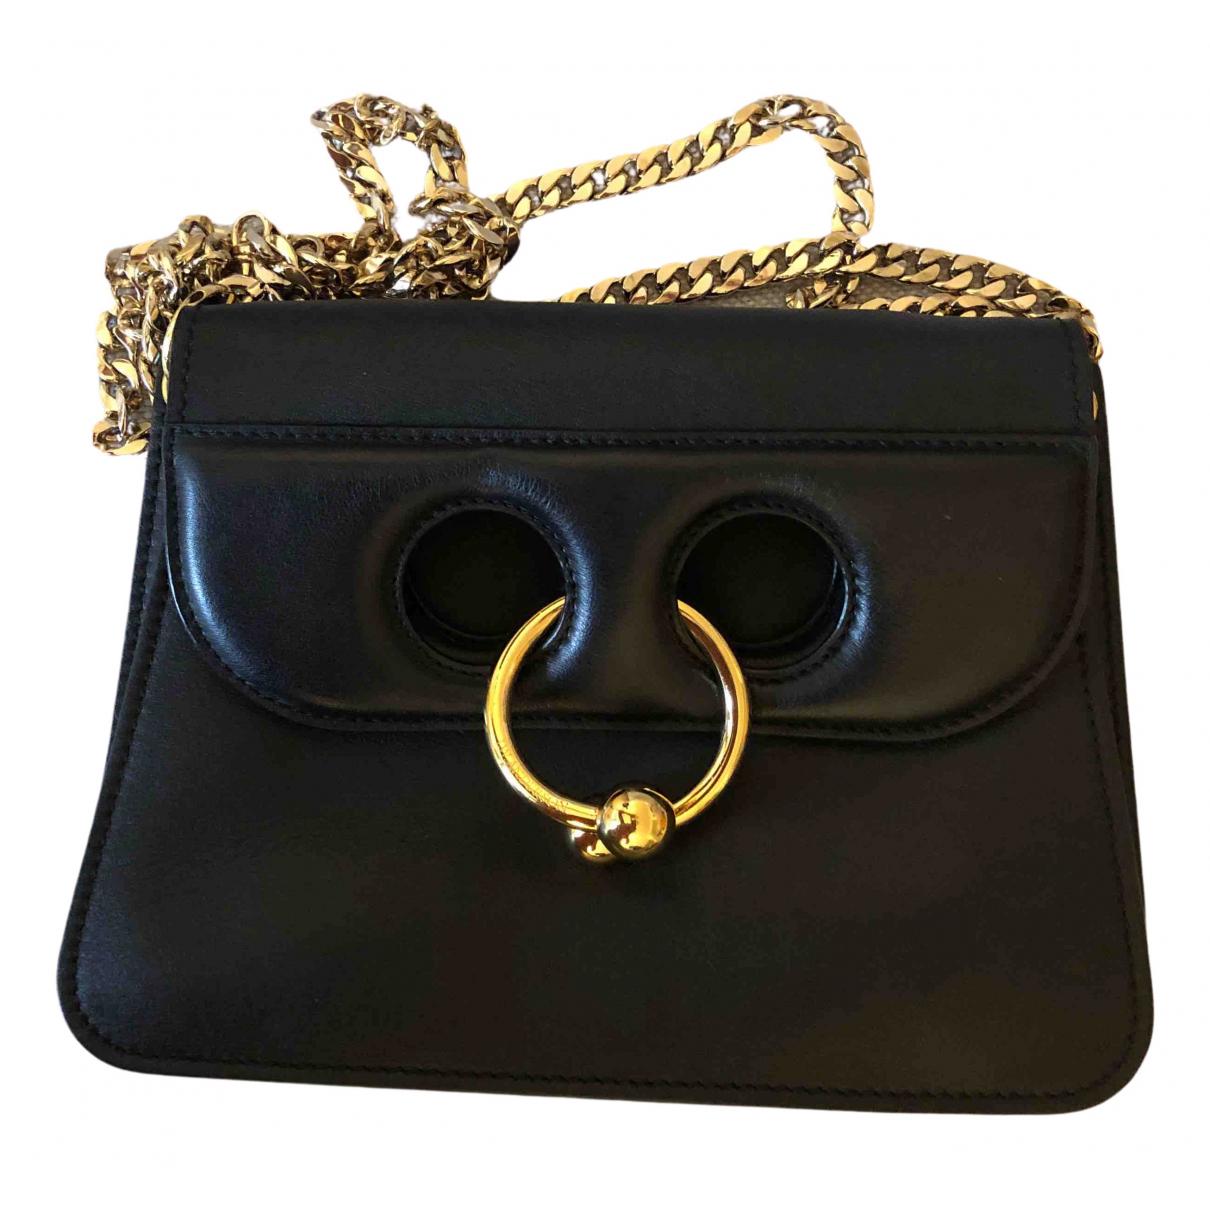 J.w. Anderson Pierce Black Leather handbag for Women N